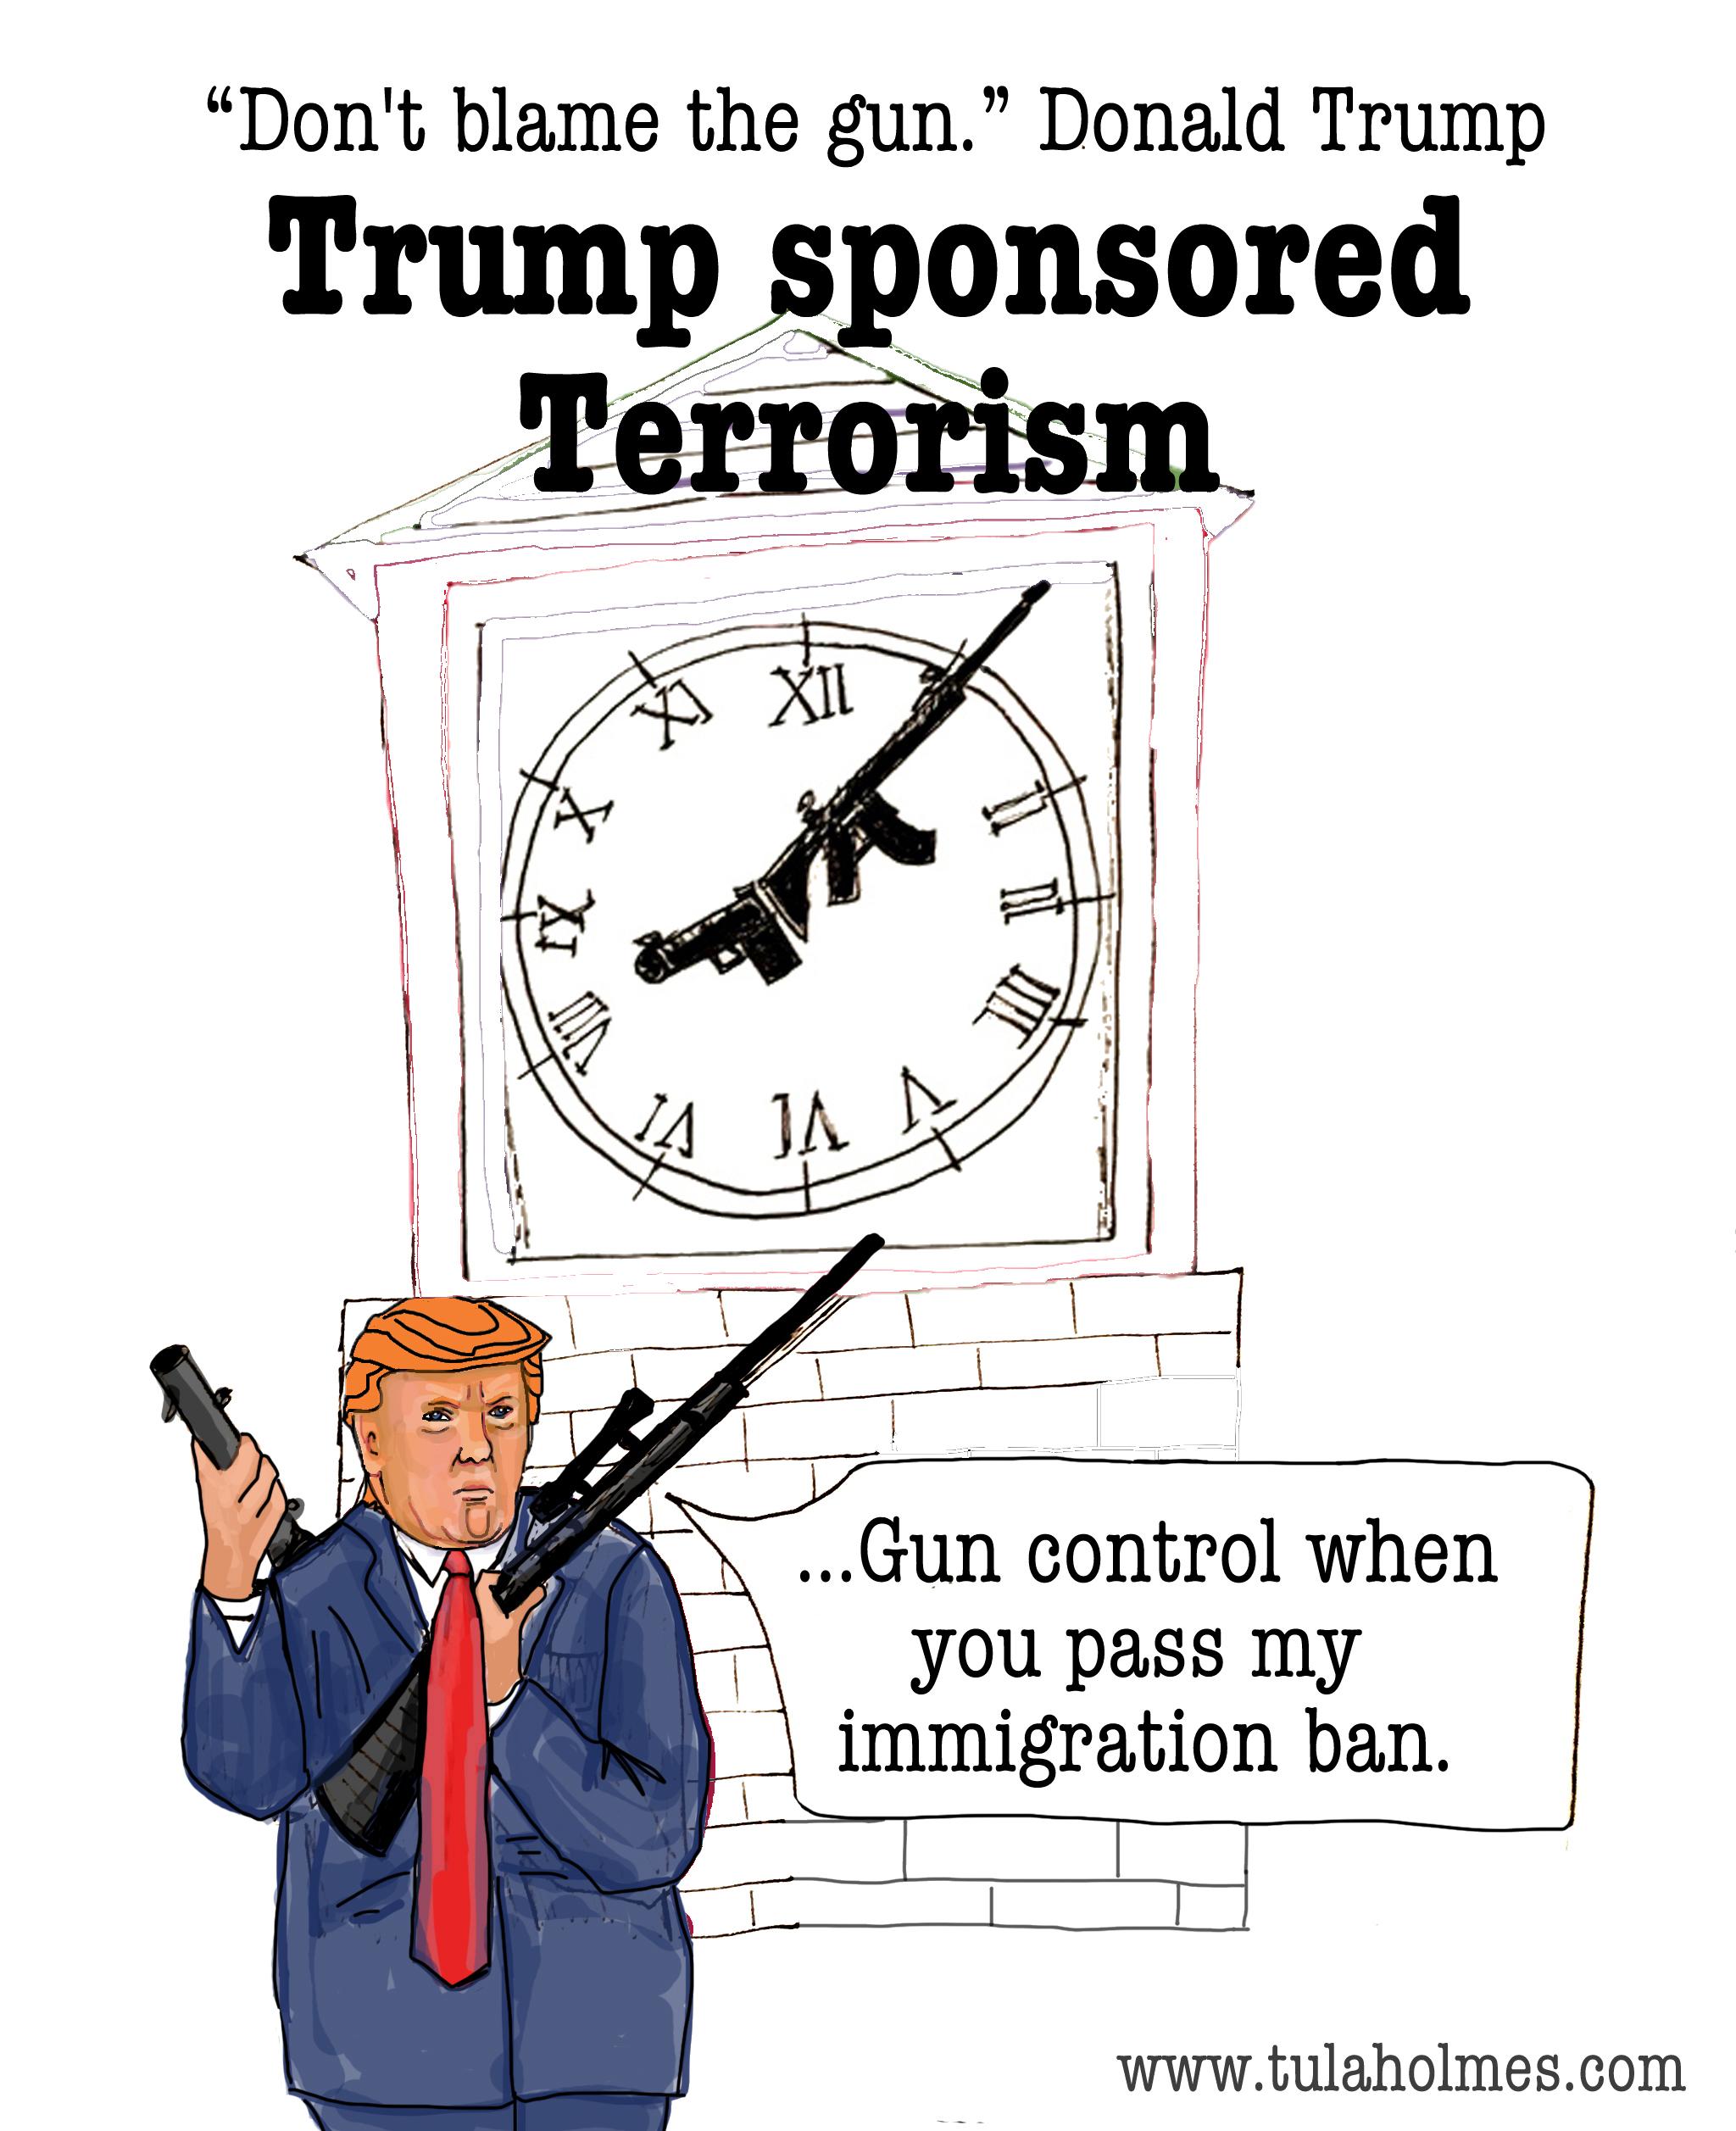 Trump Sponsored Terrorism-Copyright 2019